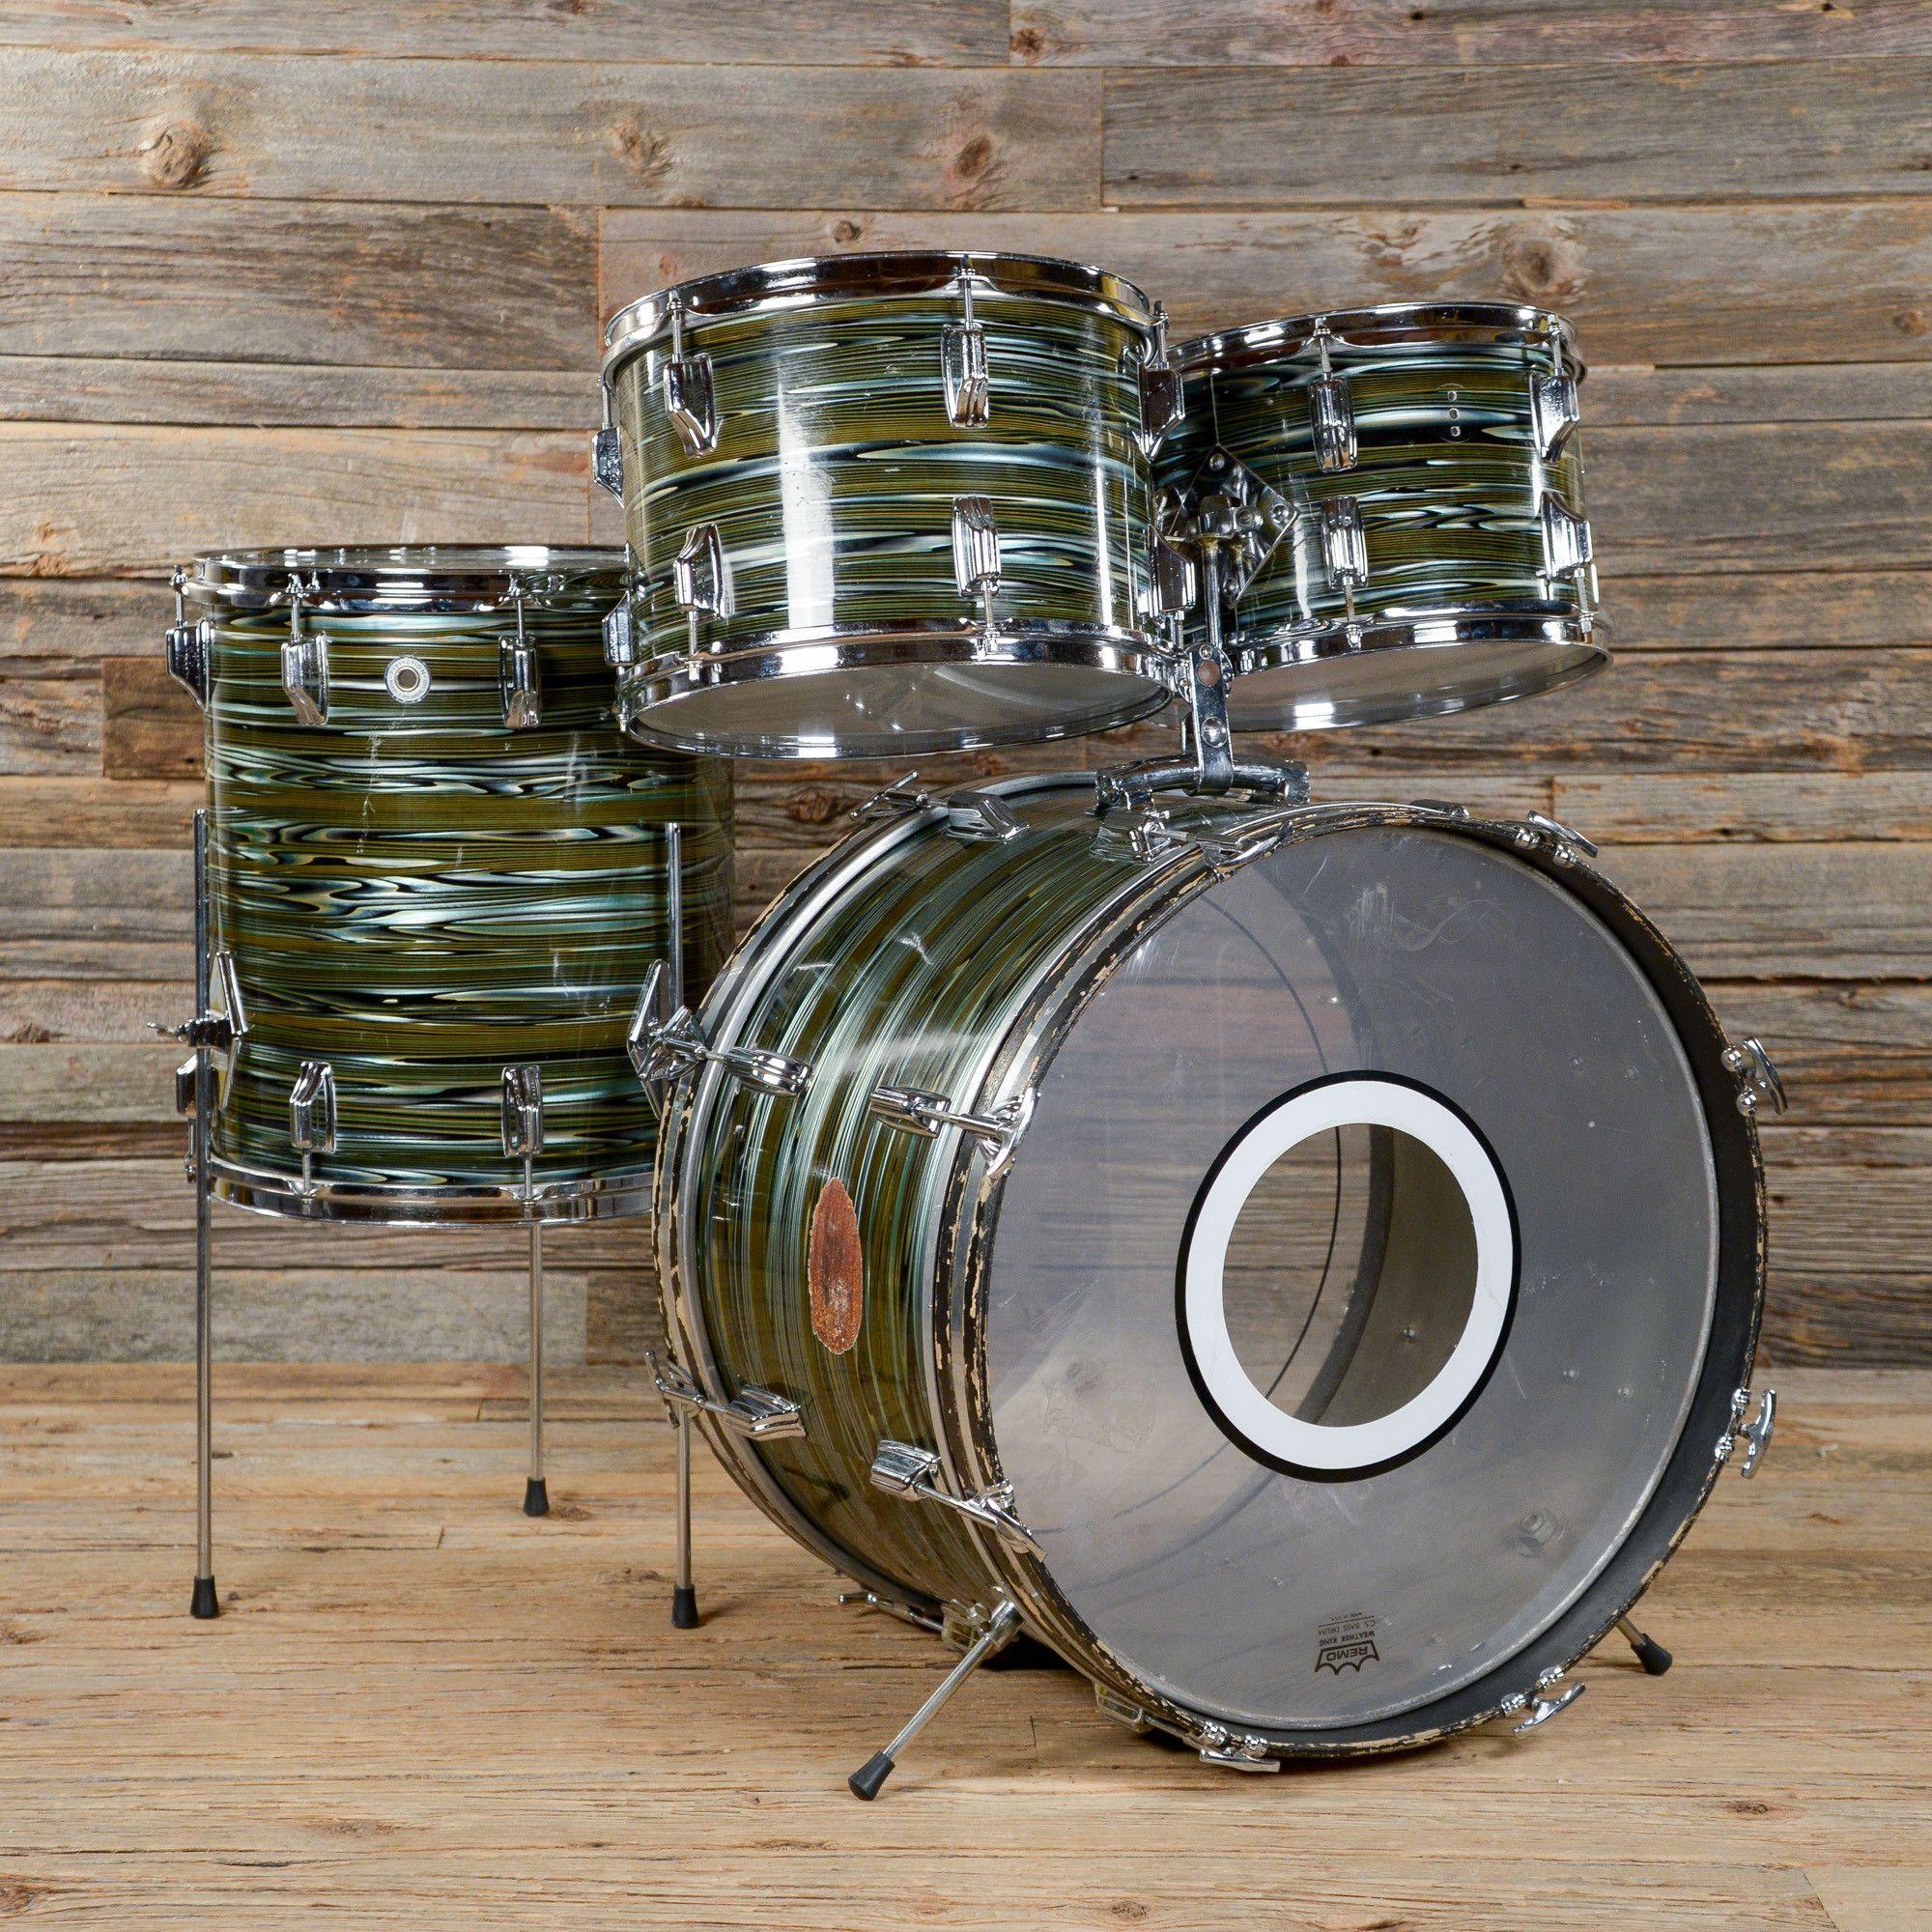 Walberg & Auge 12/13/14/22 4pc Perfection Drum Kit Avocado Strata 1970s USED